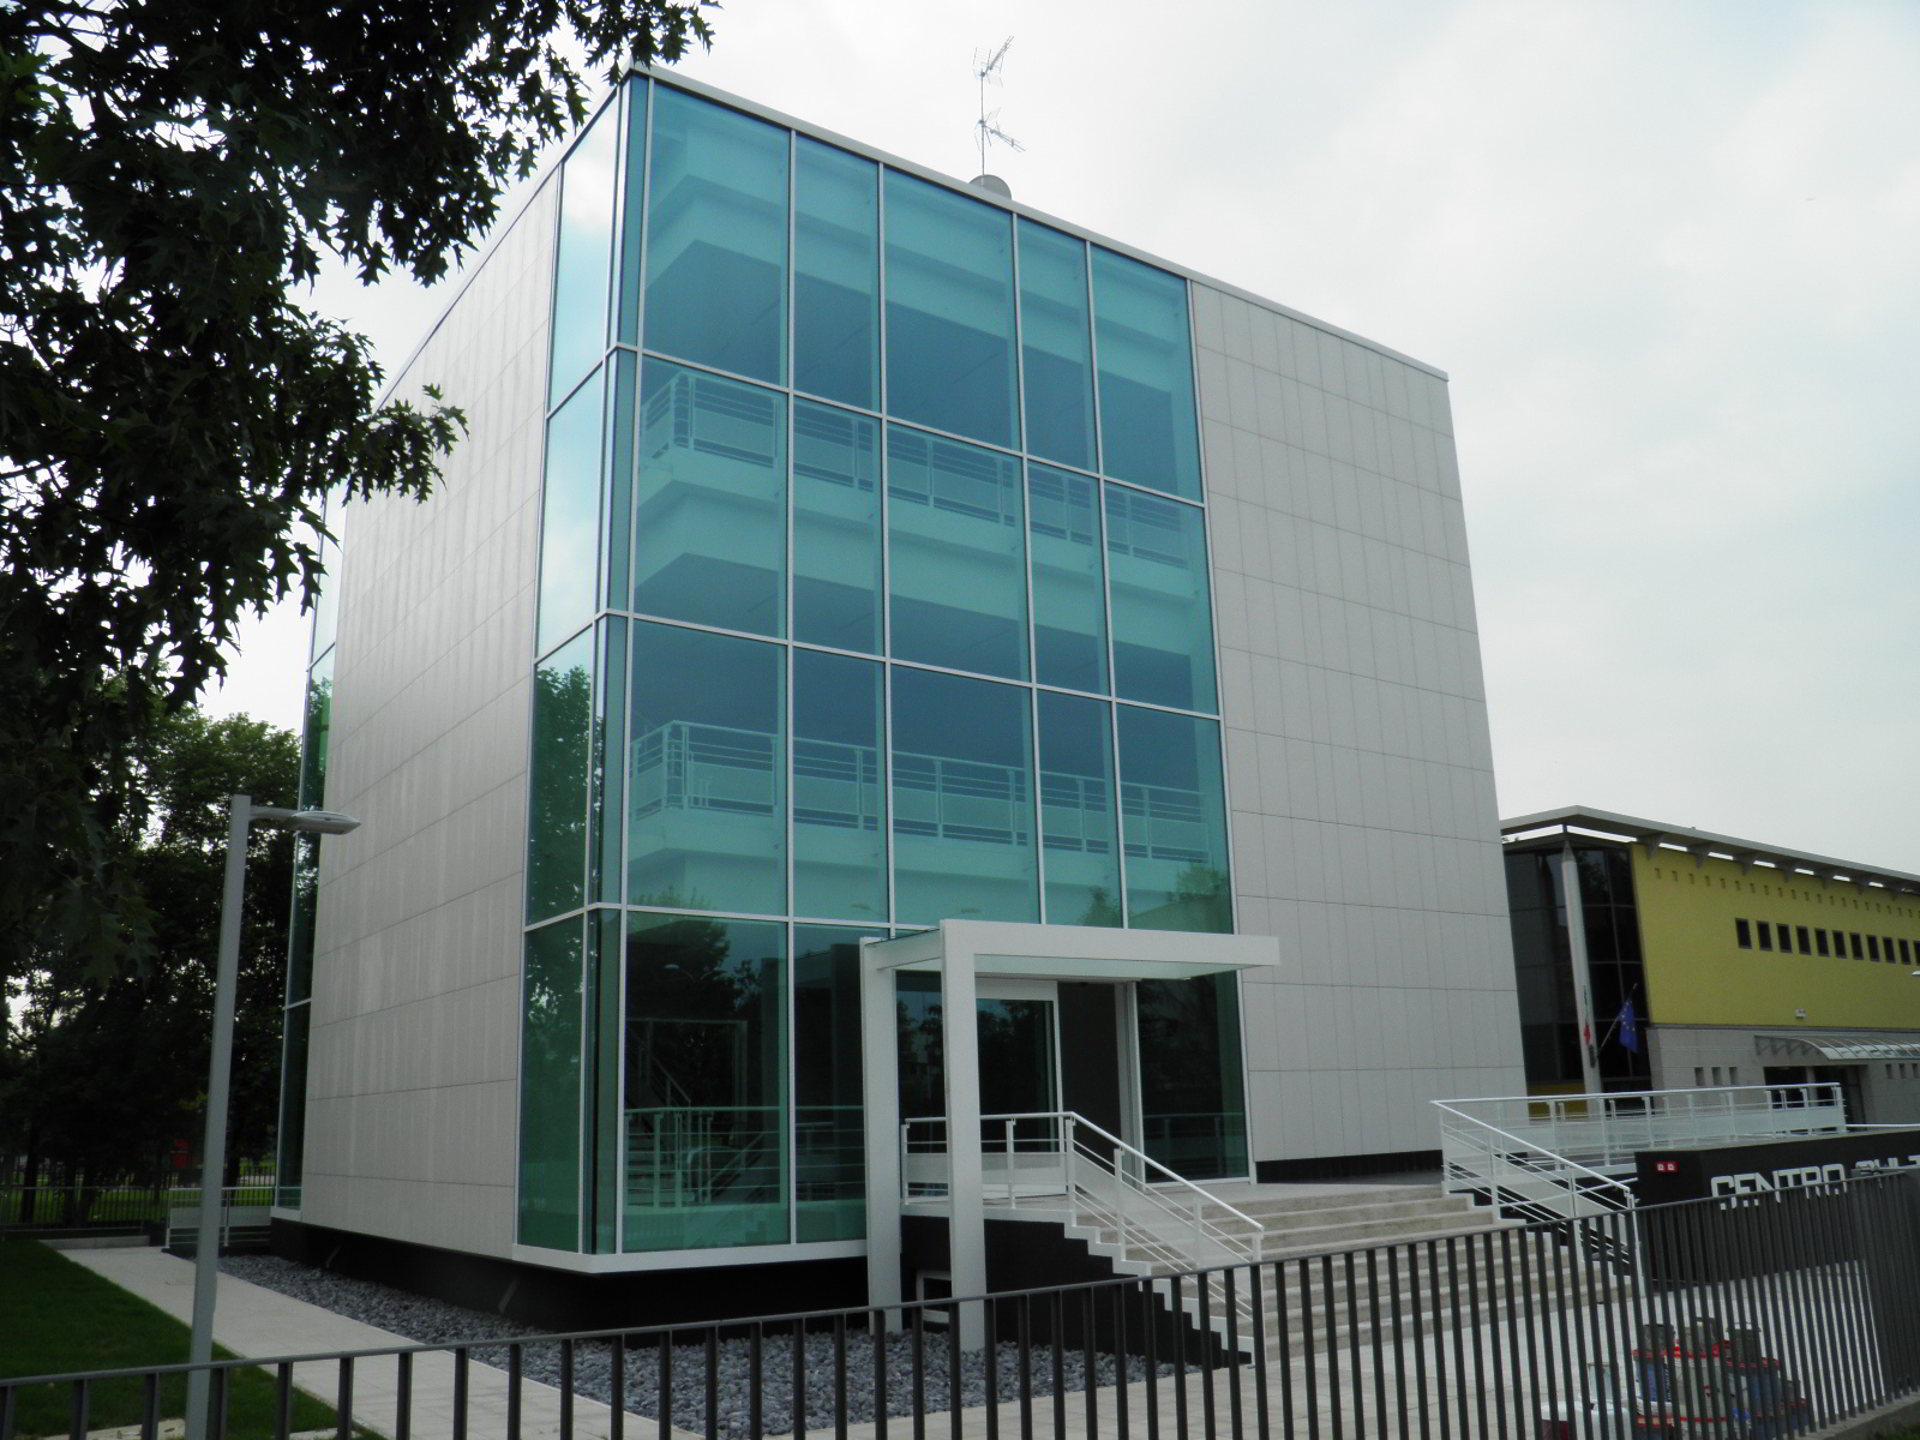 Biblioteca Comunale Brusaporto (BG) - Certificazioni RG Impianti